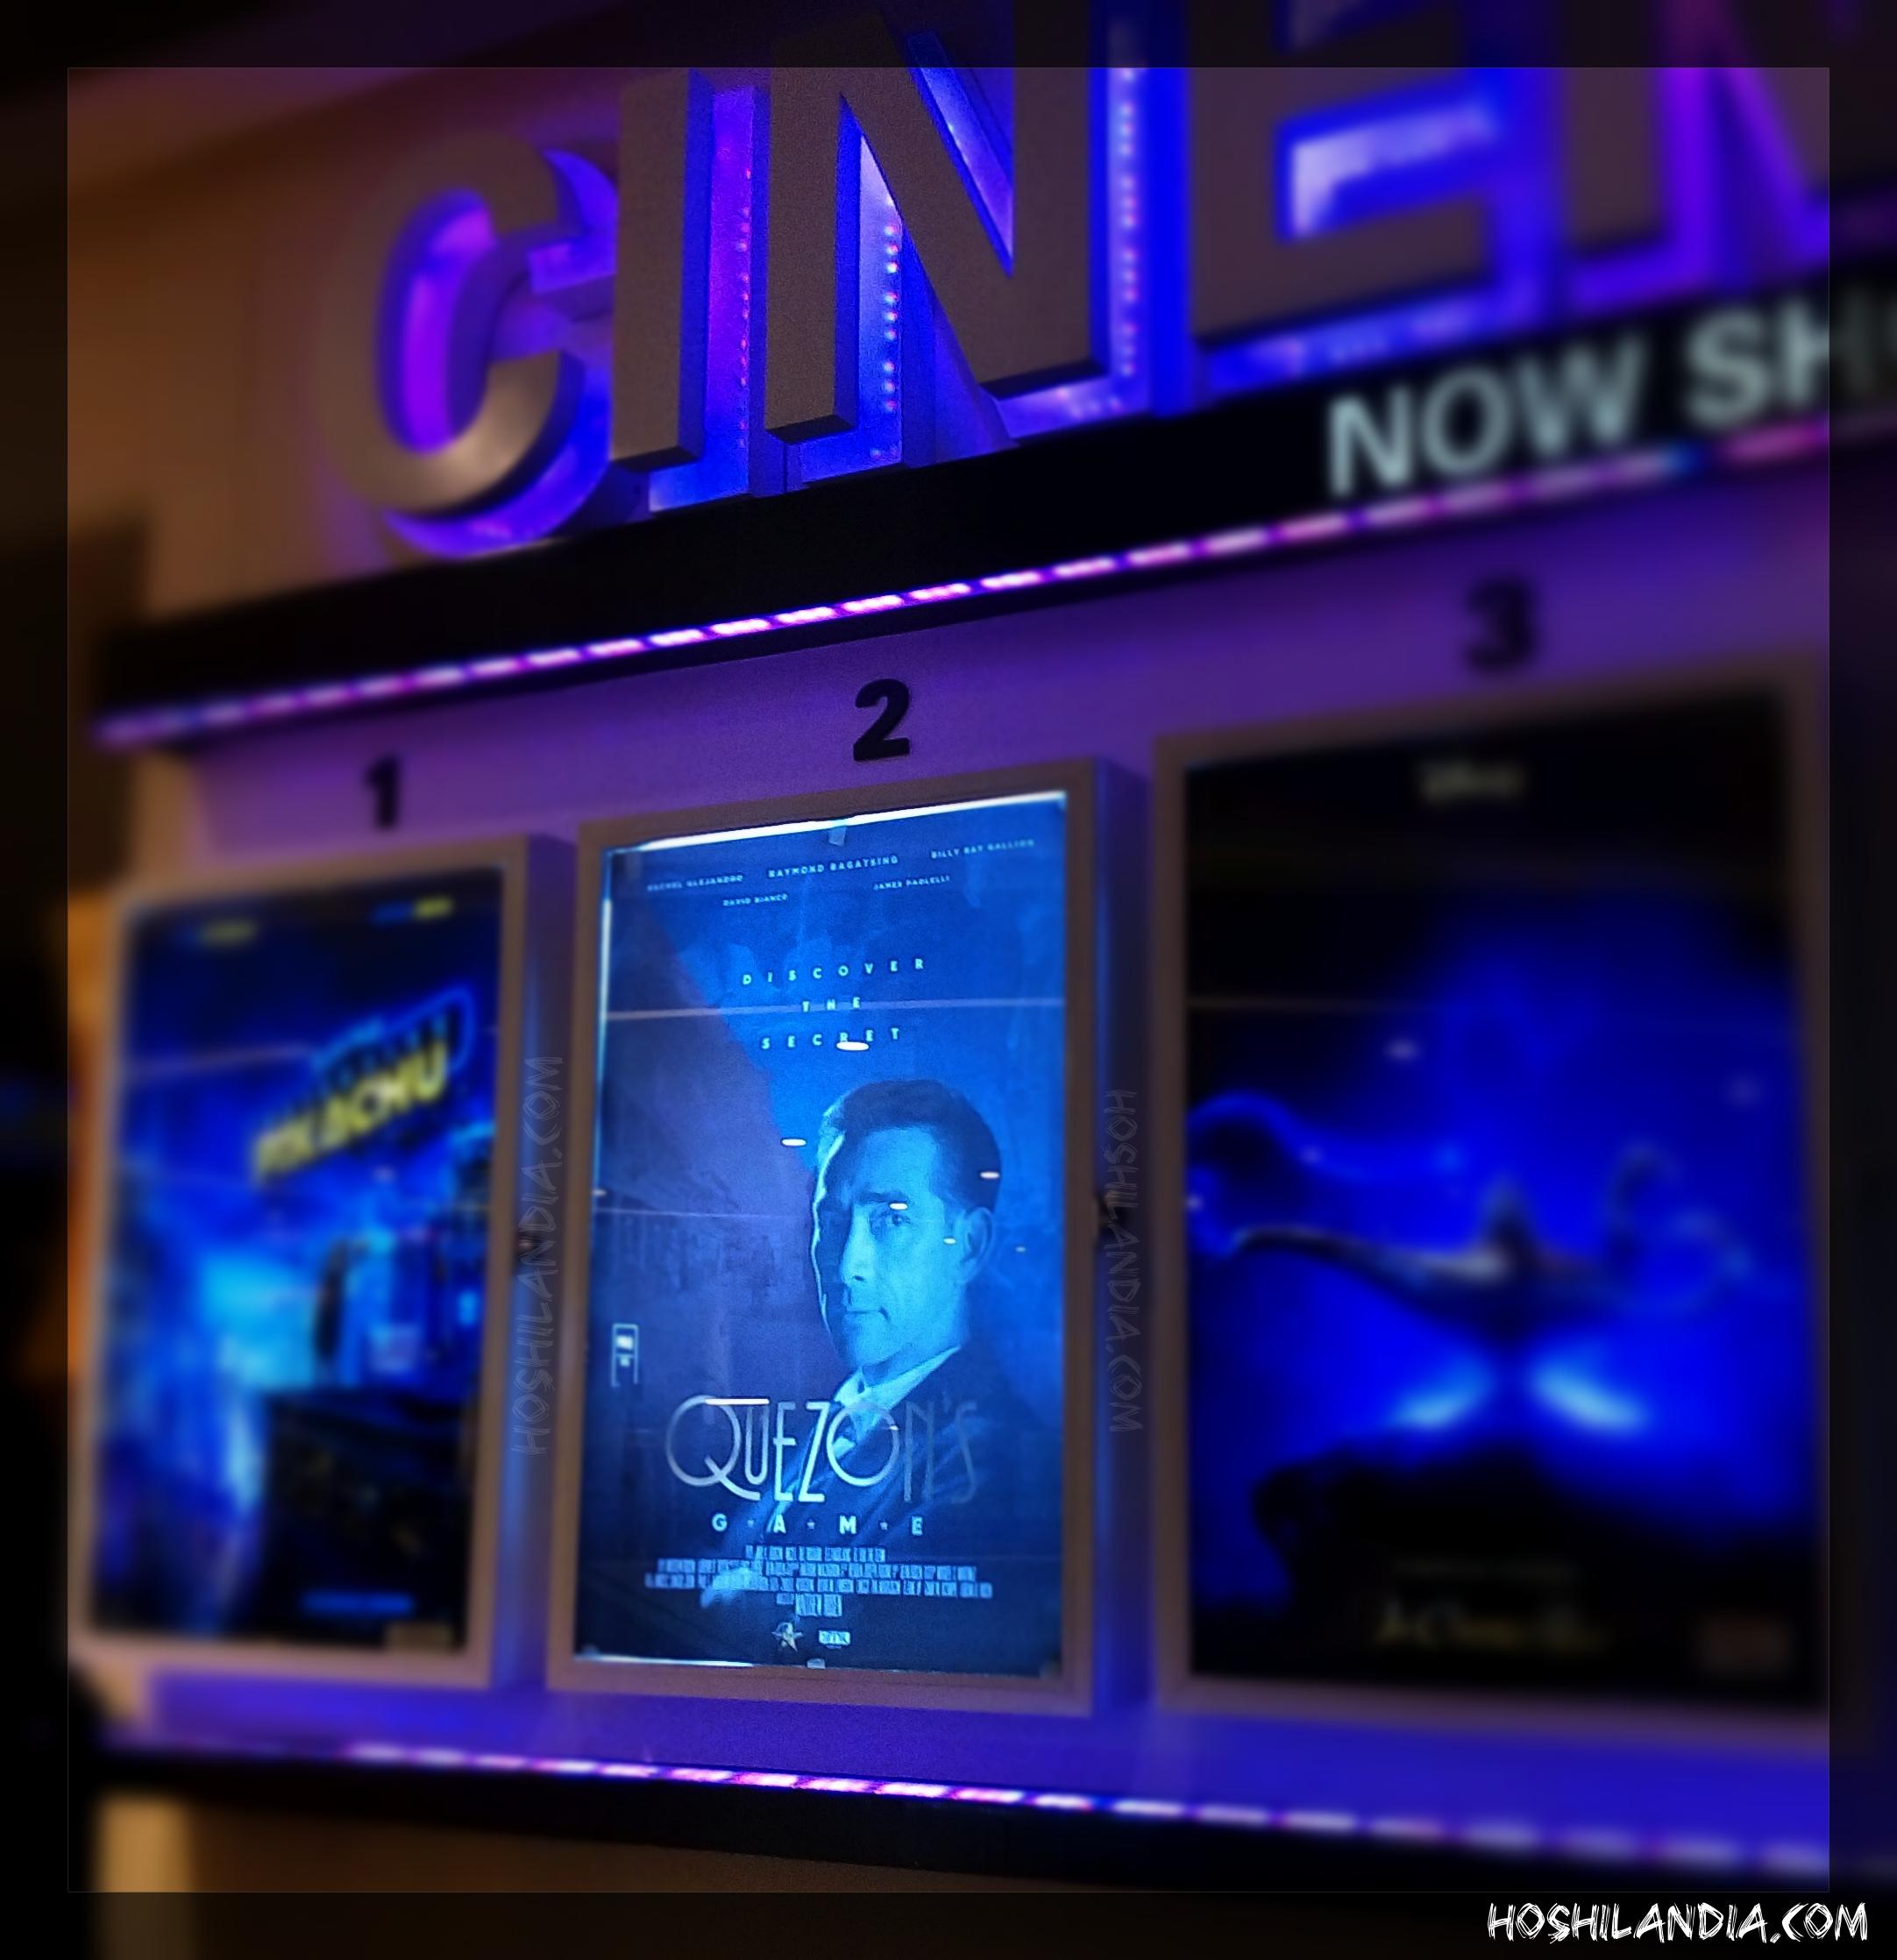 Quezon's Game  movie poster in Fairview Terraces